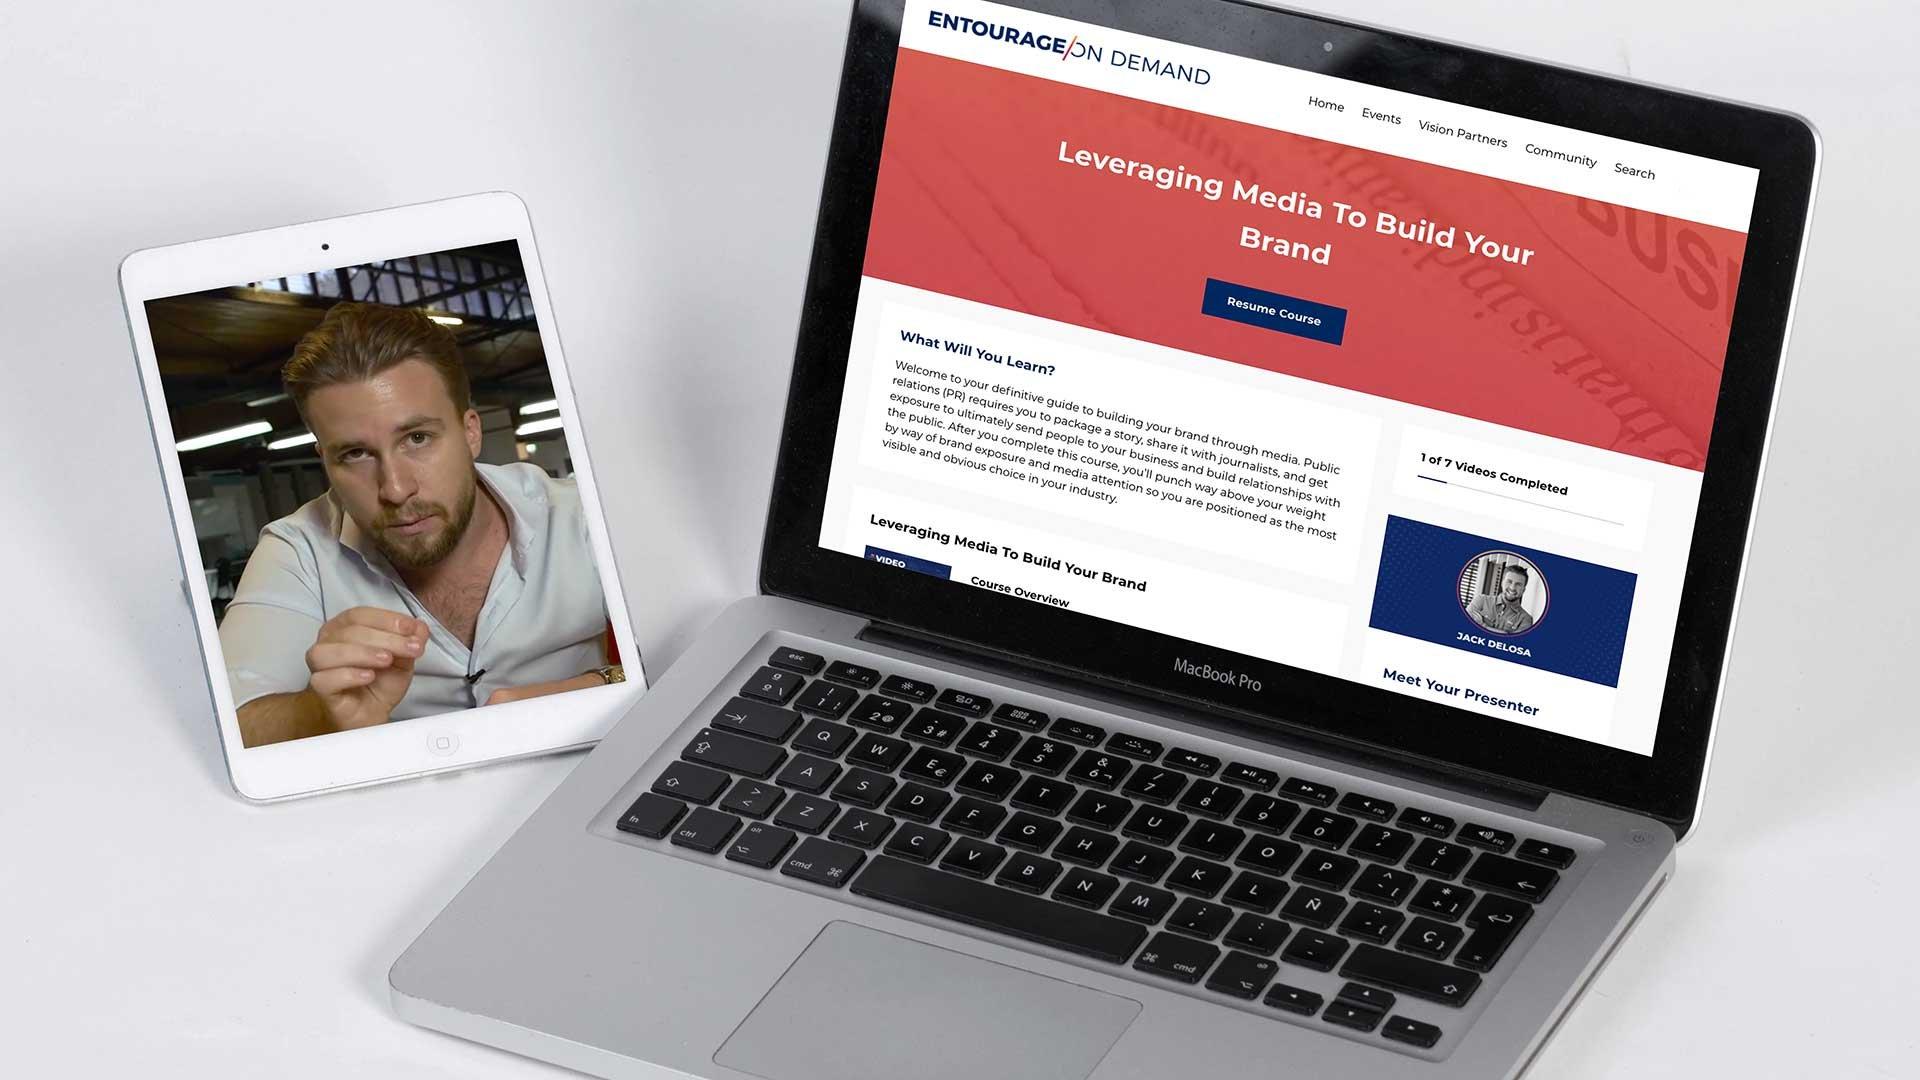 Leveraging-Media-To-Build-Brand-4